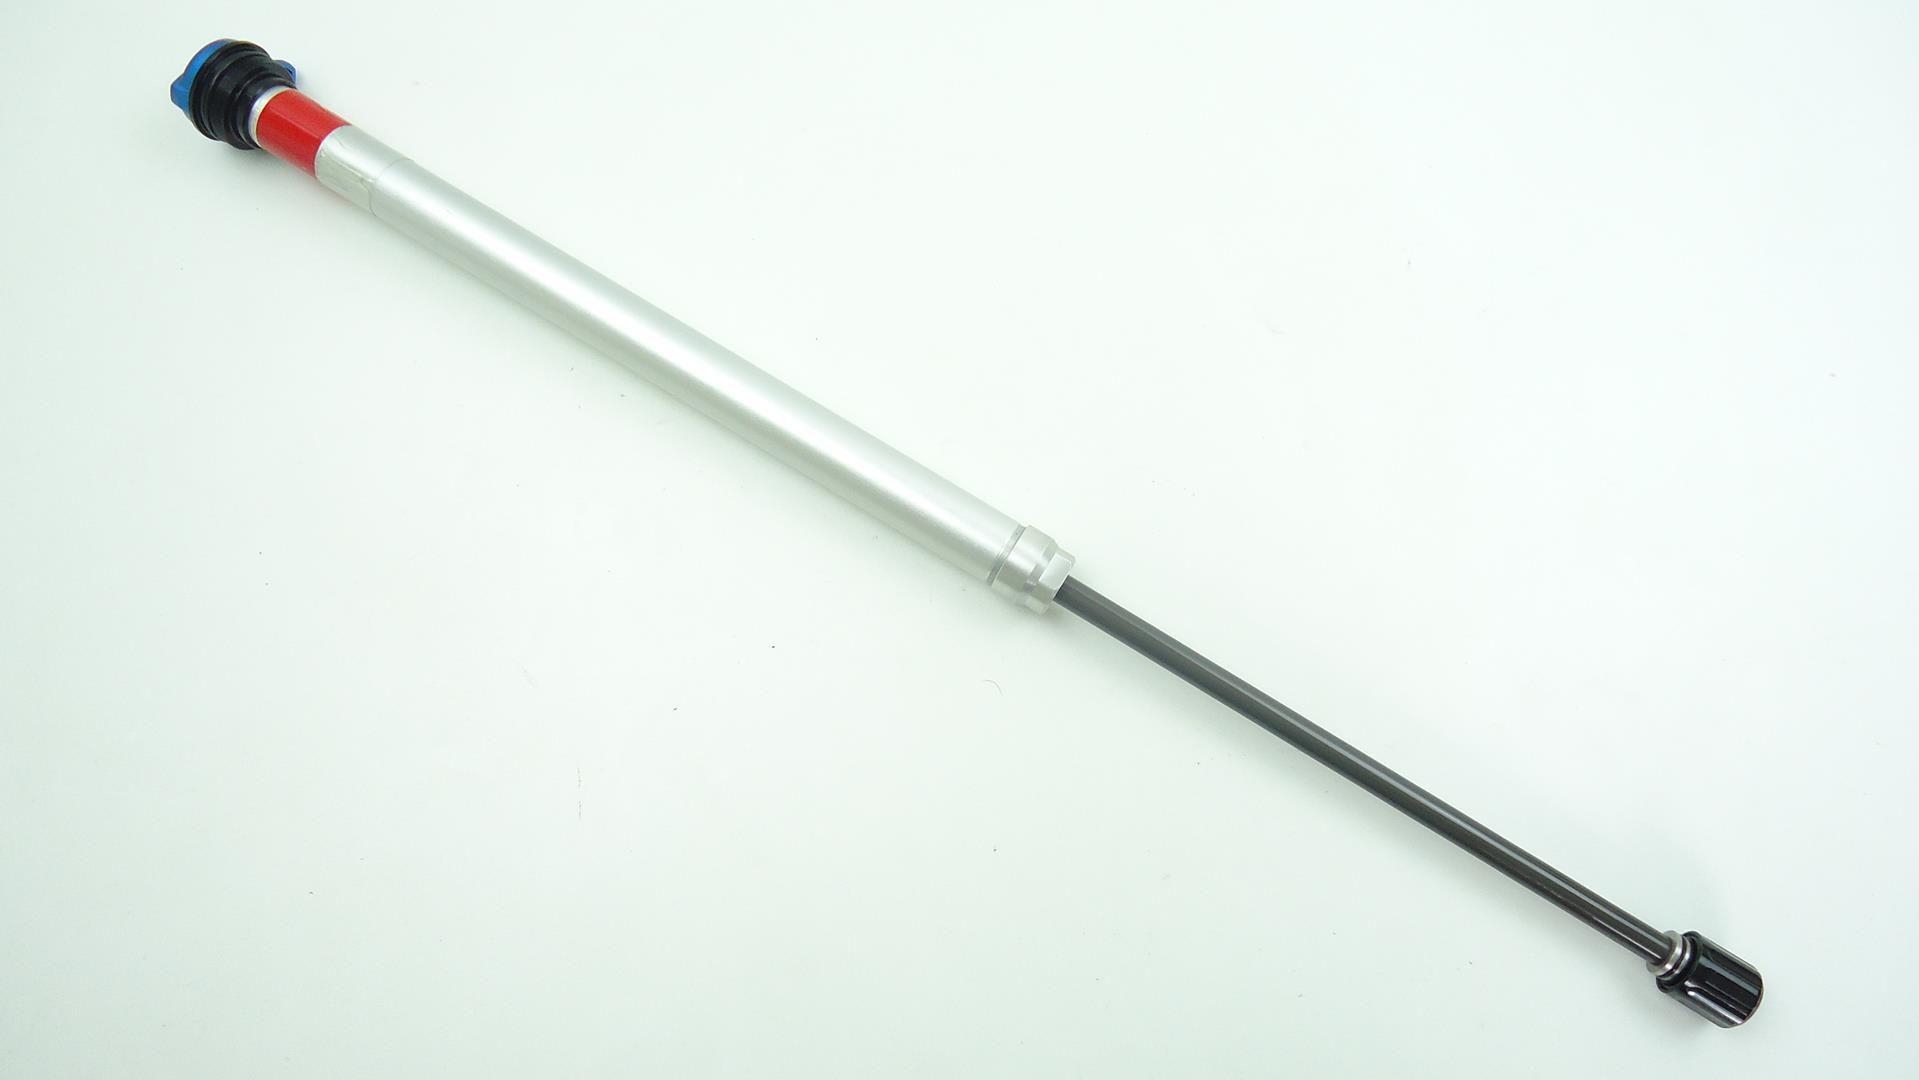 Trava Cartucho Damper FOX Grip 180mm Canelas 36mm 2 Estagios 2019